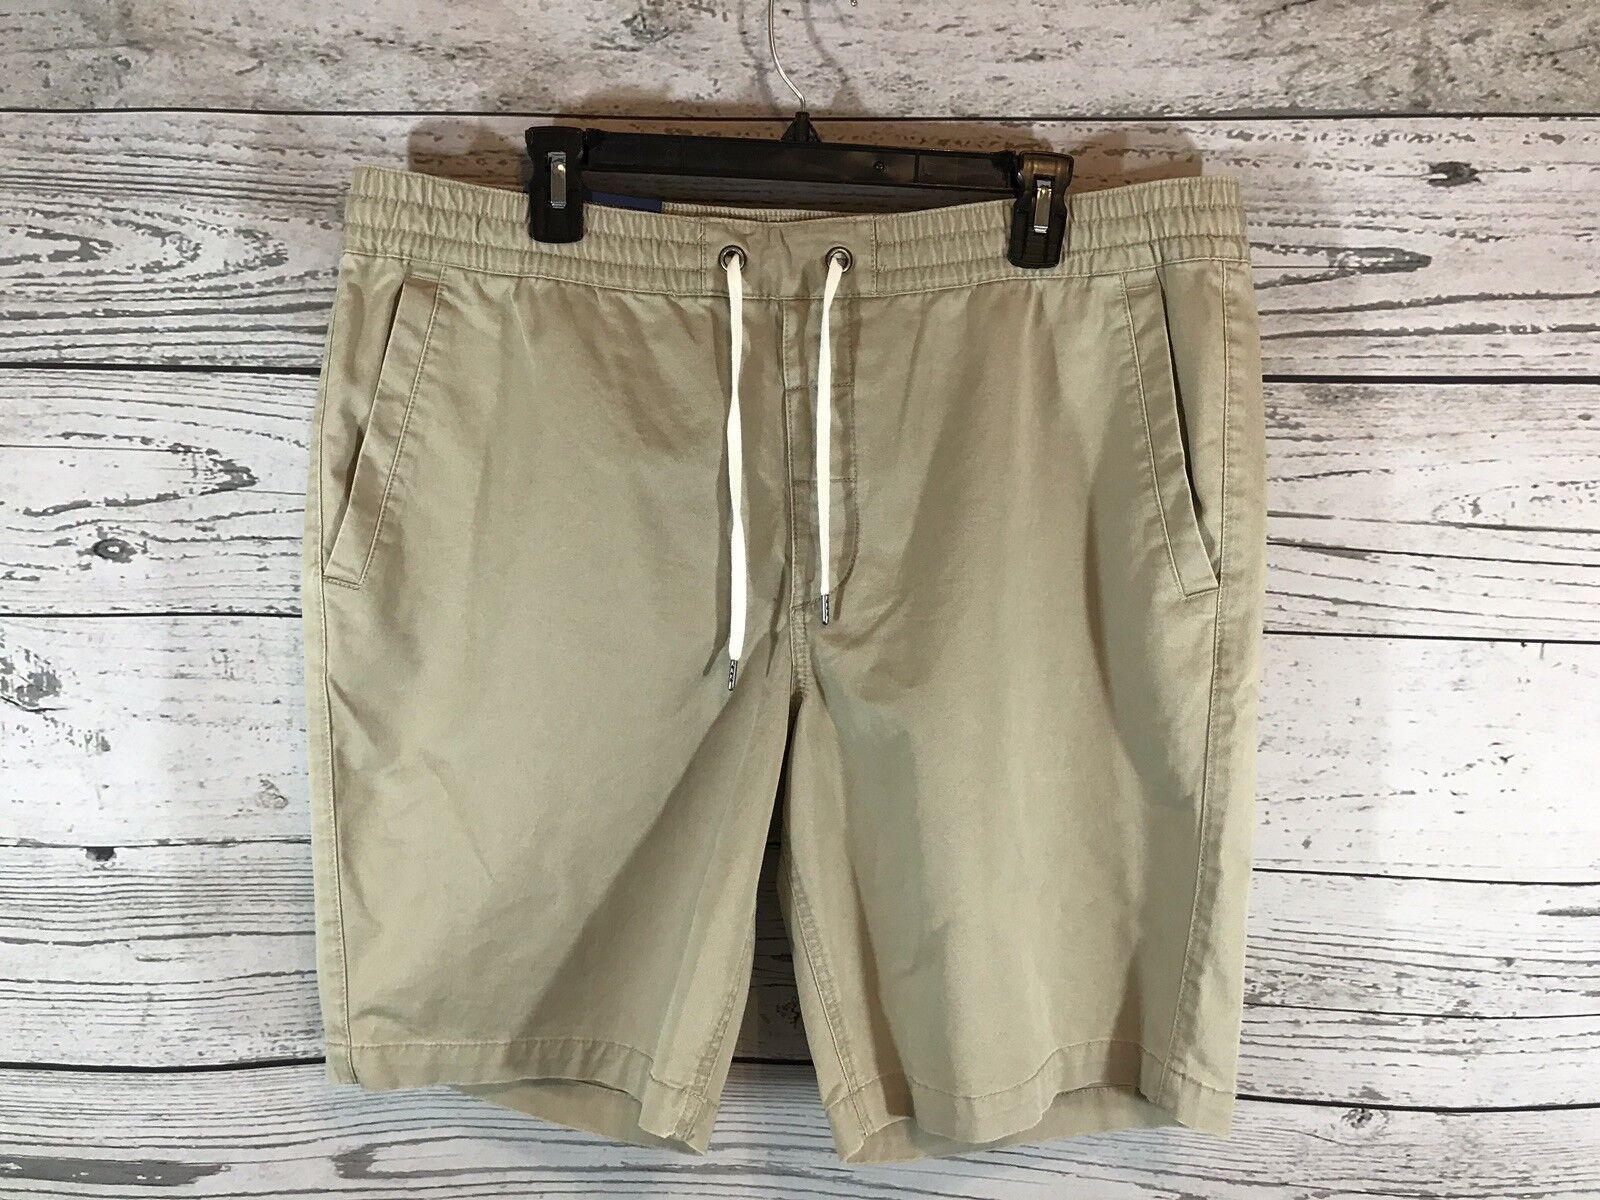 5ebcd2046735 Polo Ralph Lauren Mens Khaki Fit Drawstring Shorts XL X-Large NWT Classic  Tan ntkwse20284-Shorts